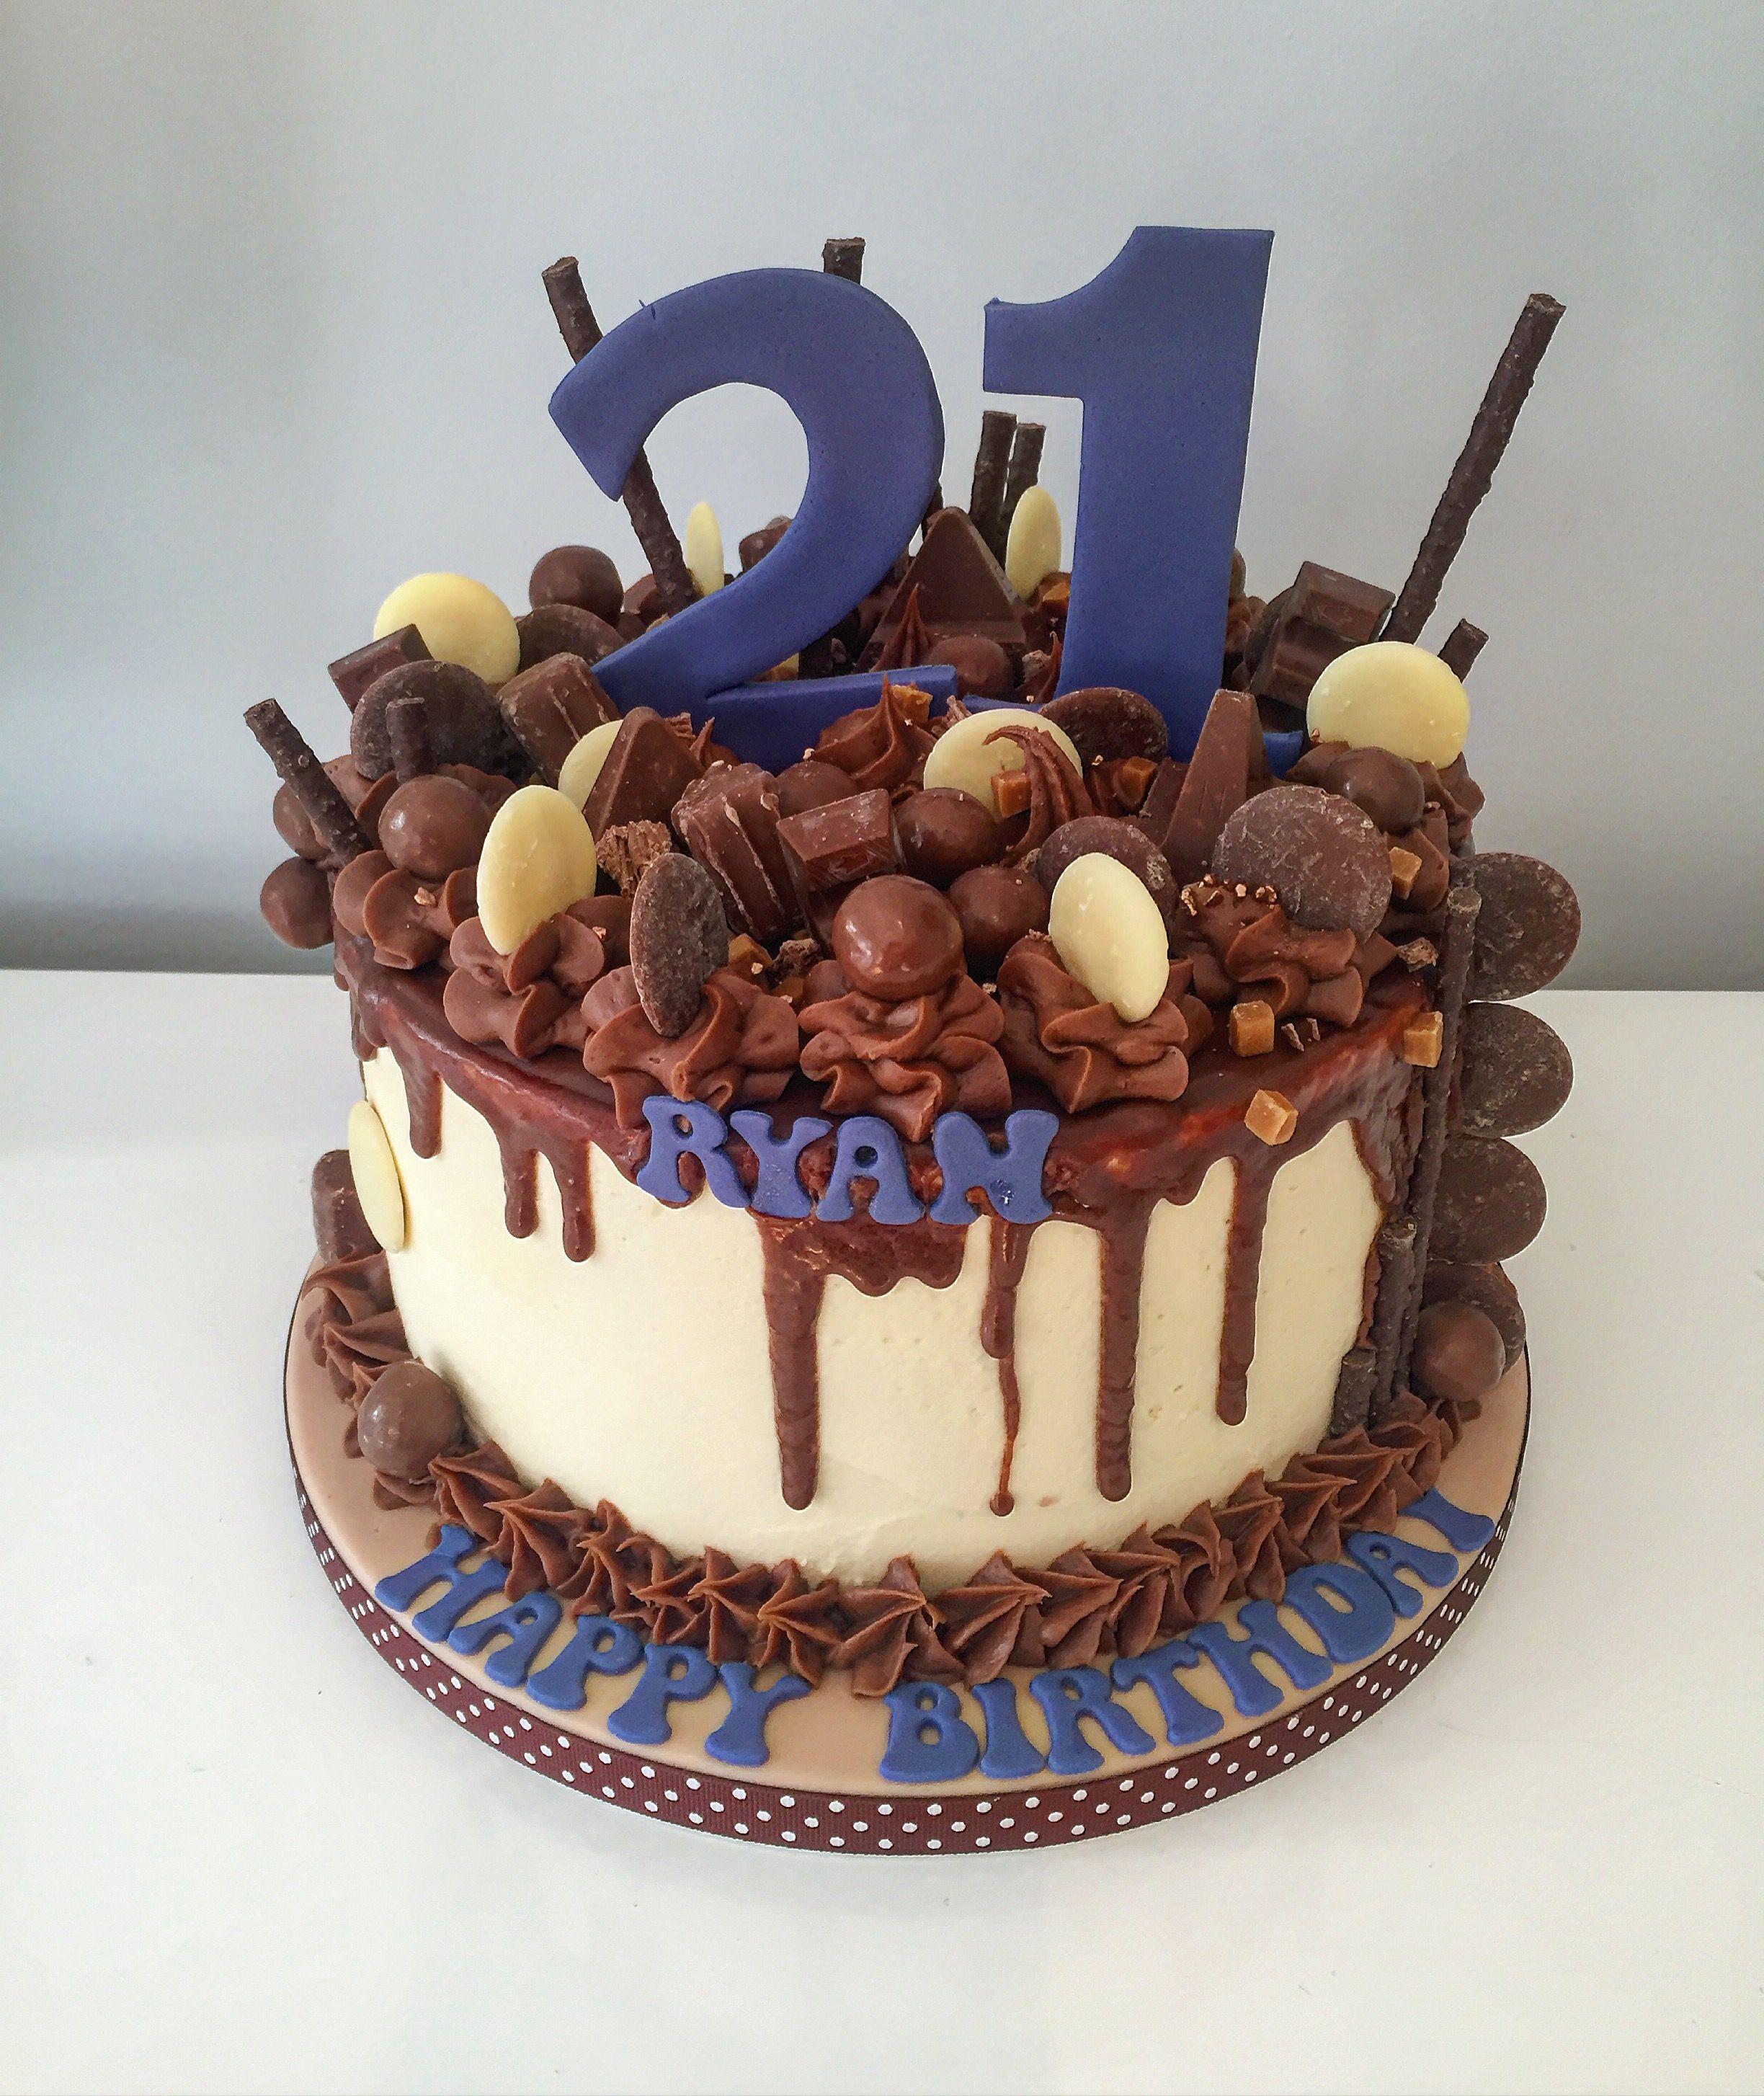 21st Birthday Drip Cake Chocolate Buttons Malteaser